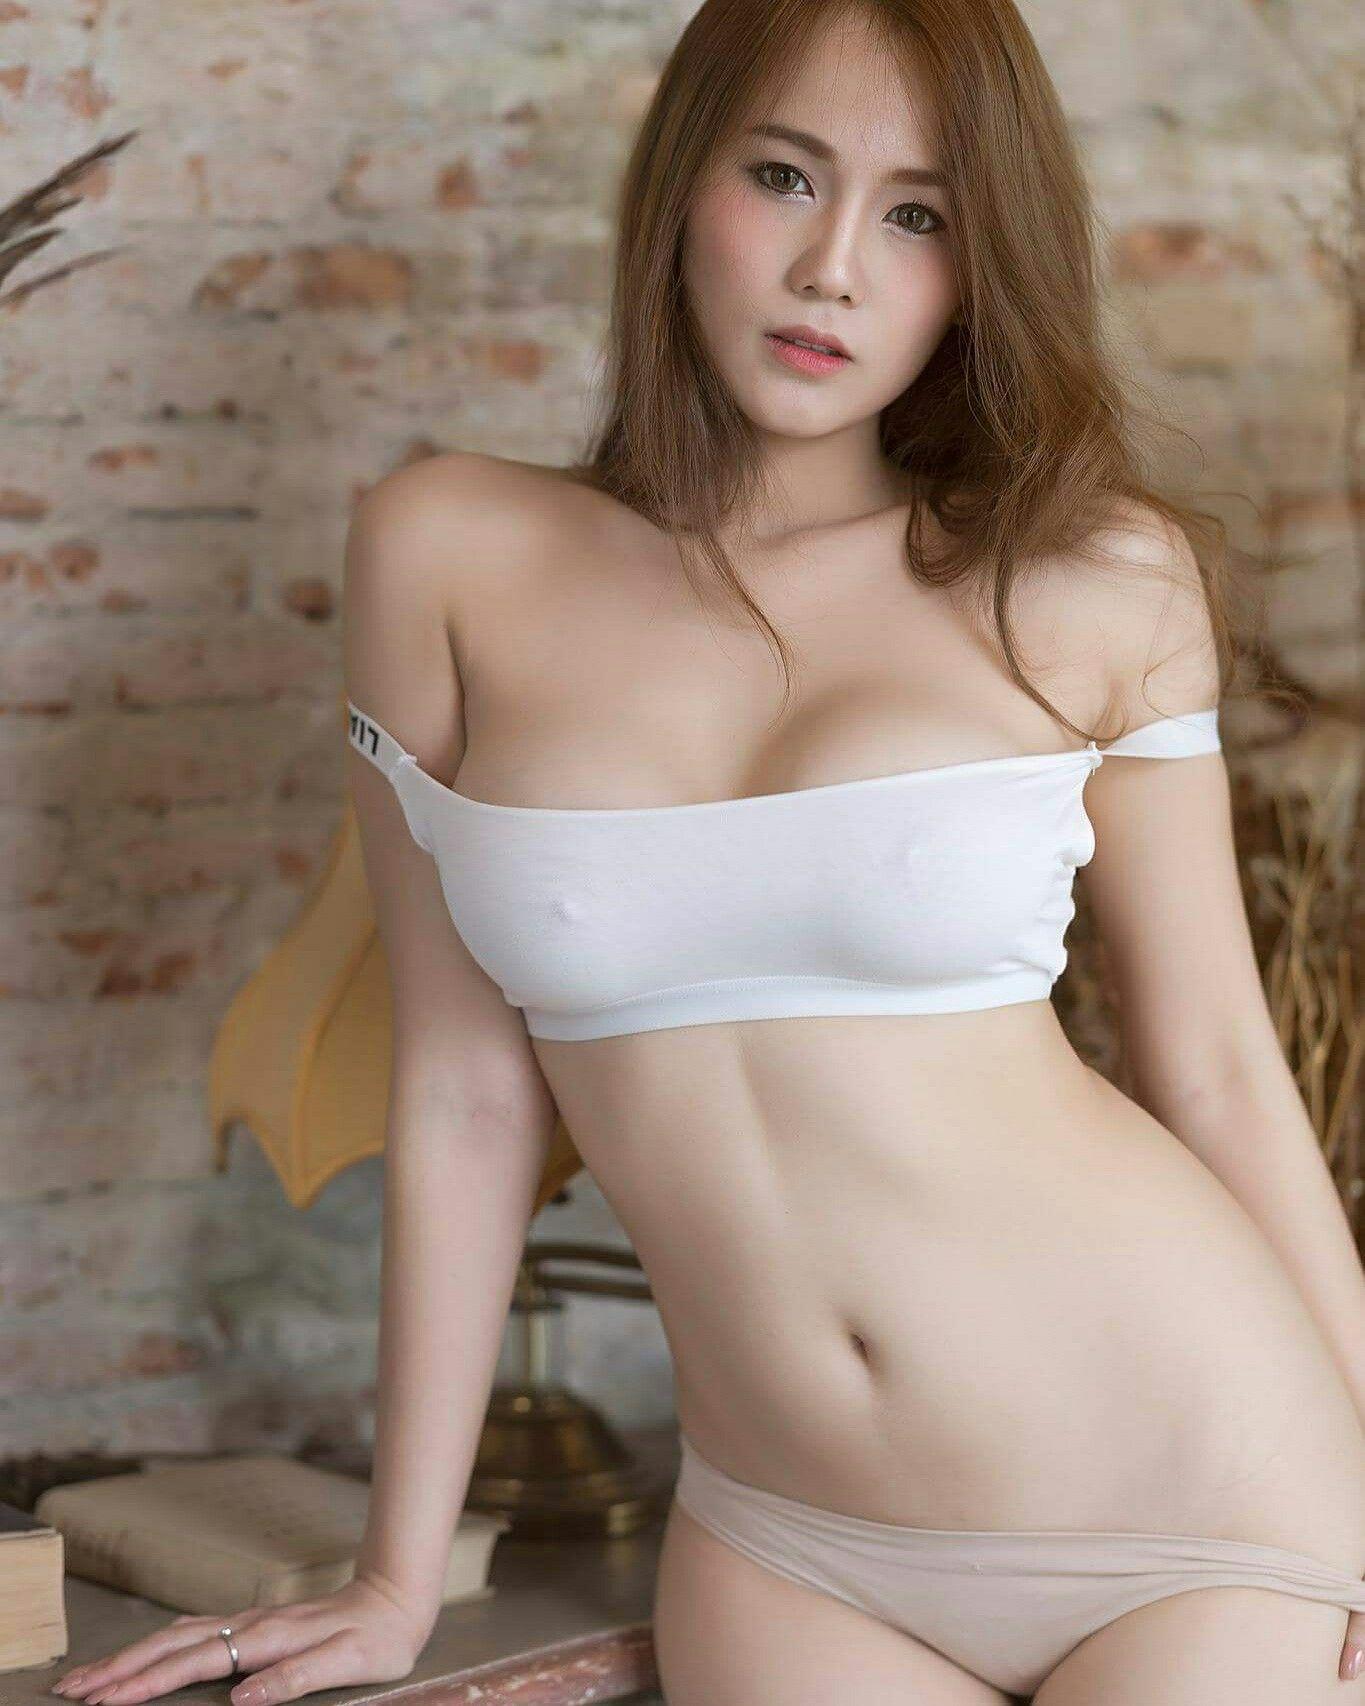 lactating tits nude gifs